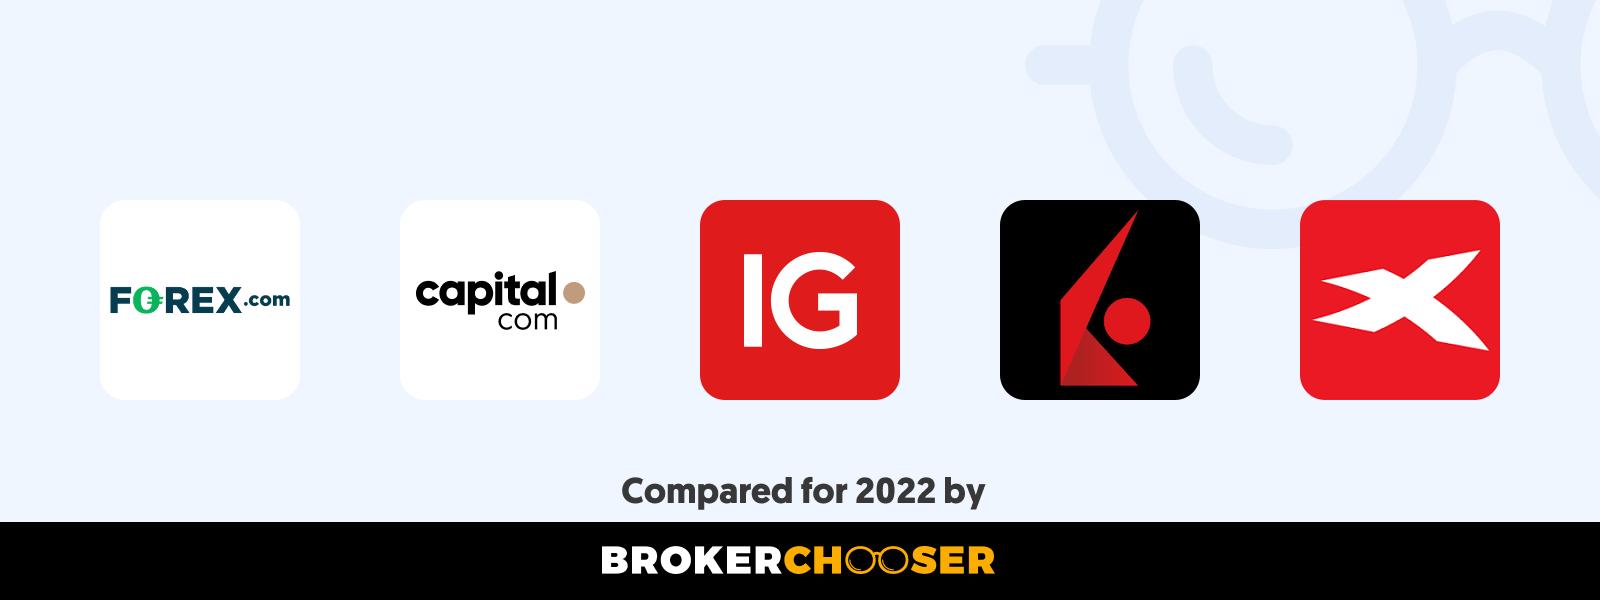 Best forex brokers for beginners in Malawi in 2021